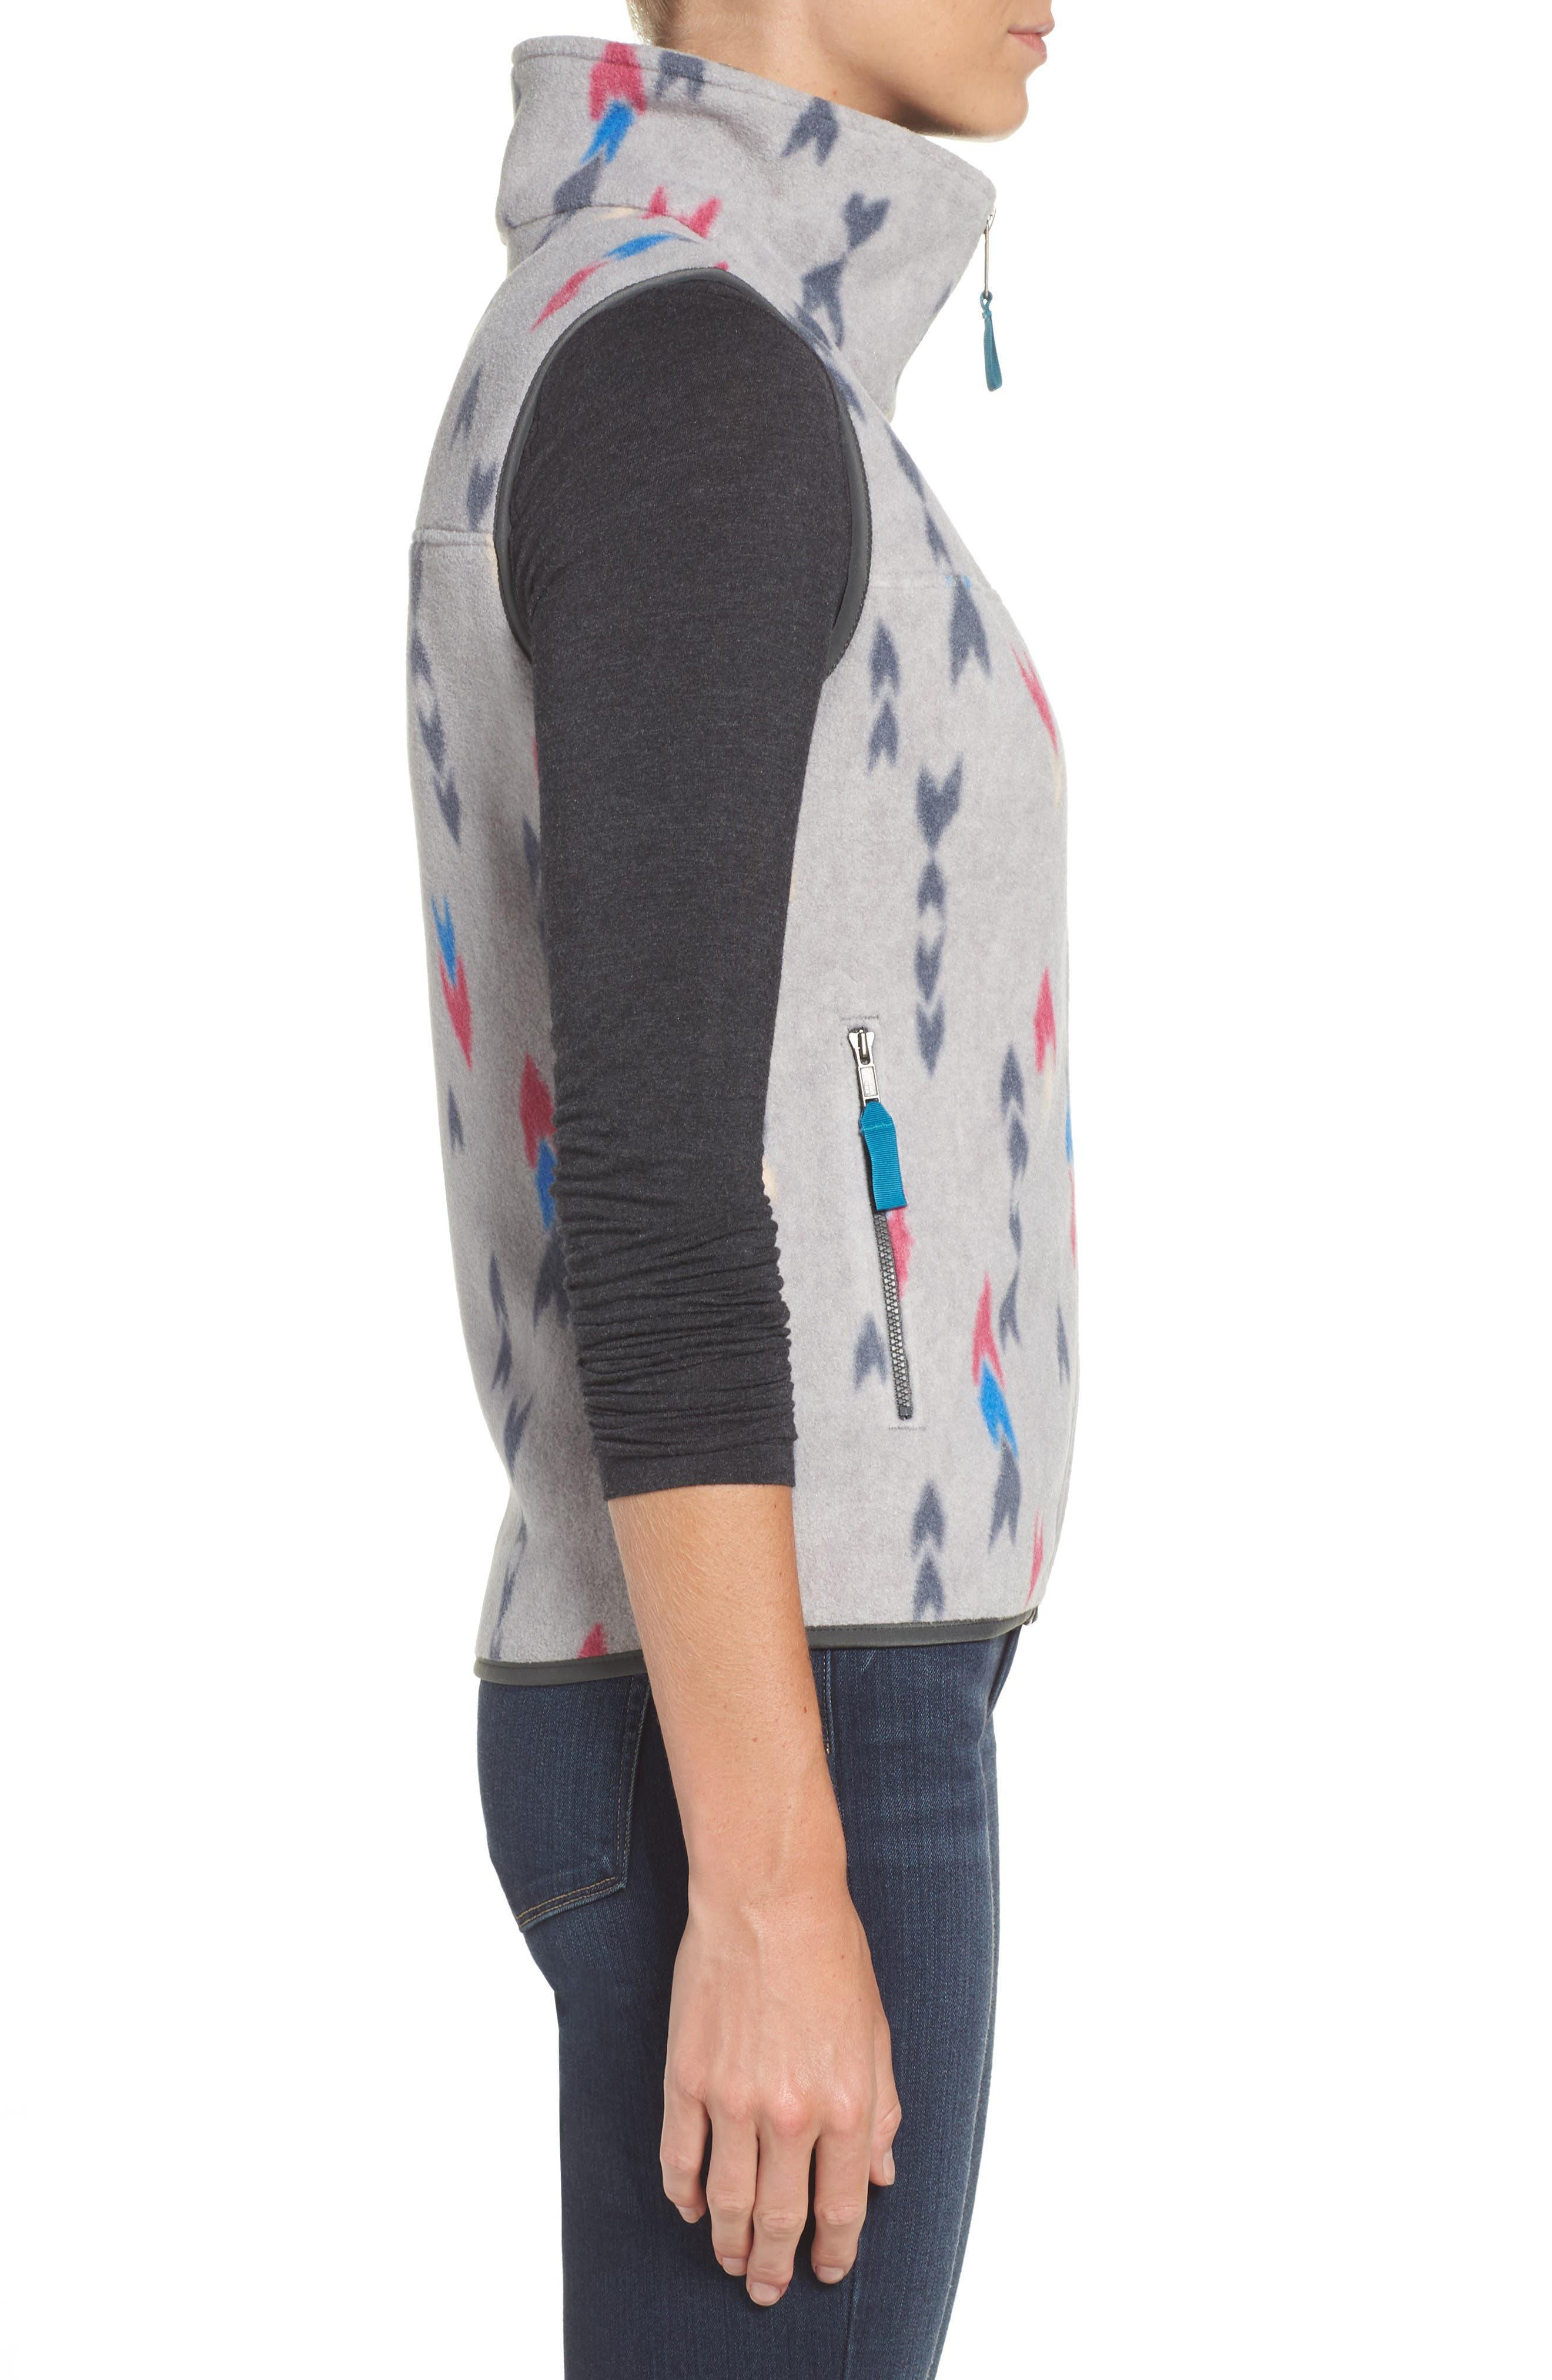 Snap-T<sup>®</sup> Fleece Vest,                             Alternate thumbnail 3, color,                             Wish Tails Big/ Craft Pink